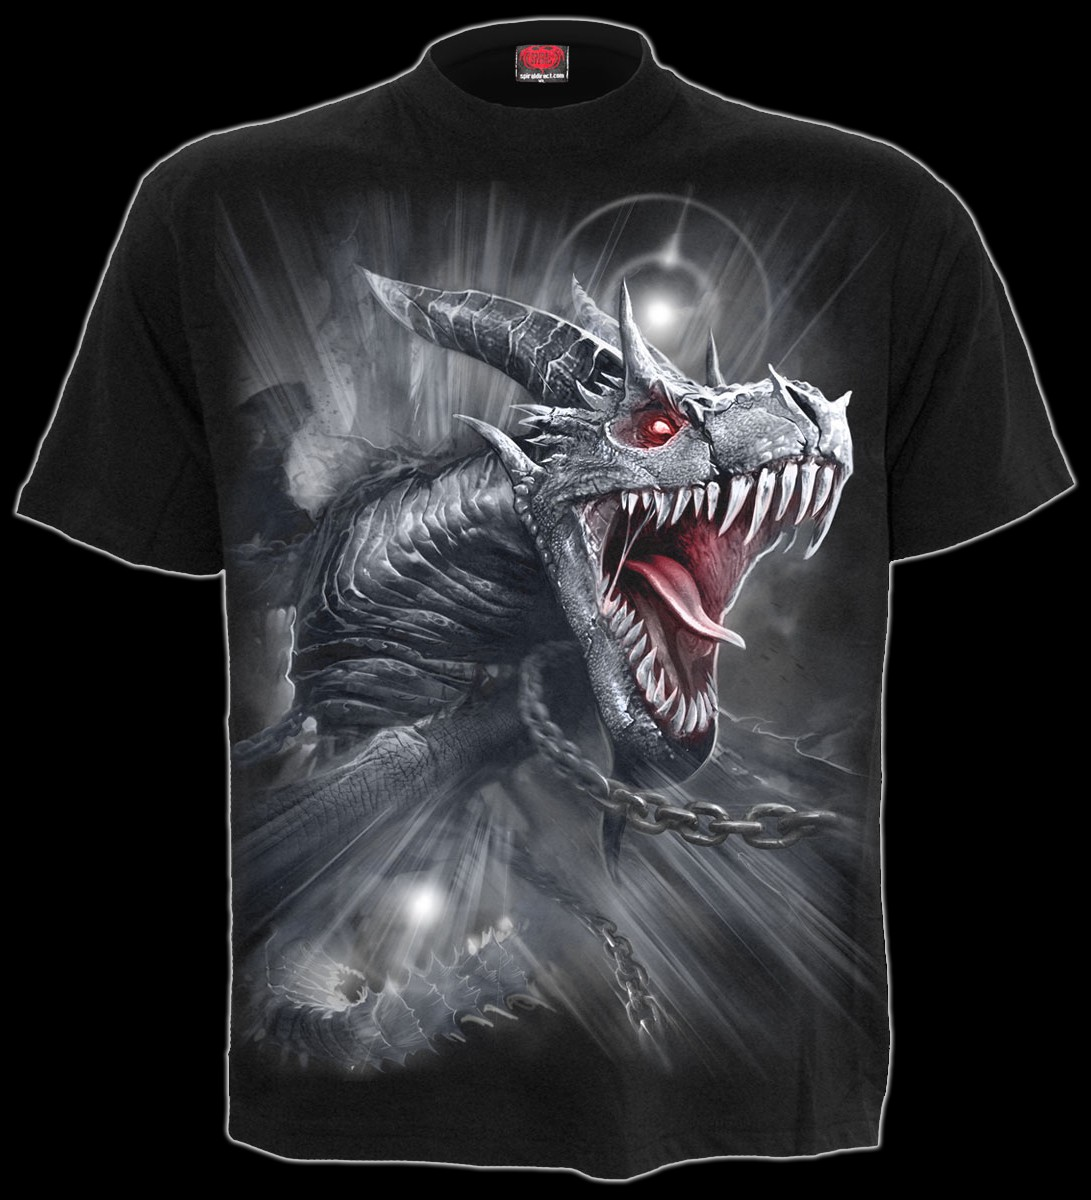 Drachen T-Shirt - Dragon's Cry